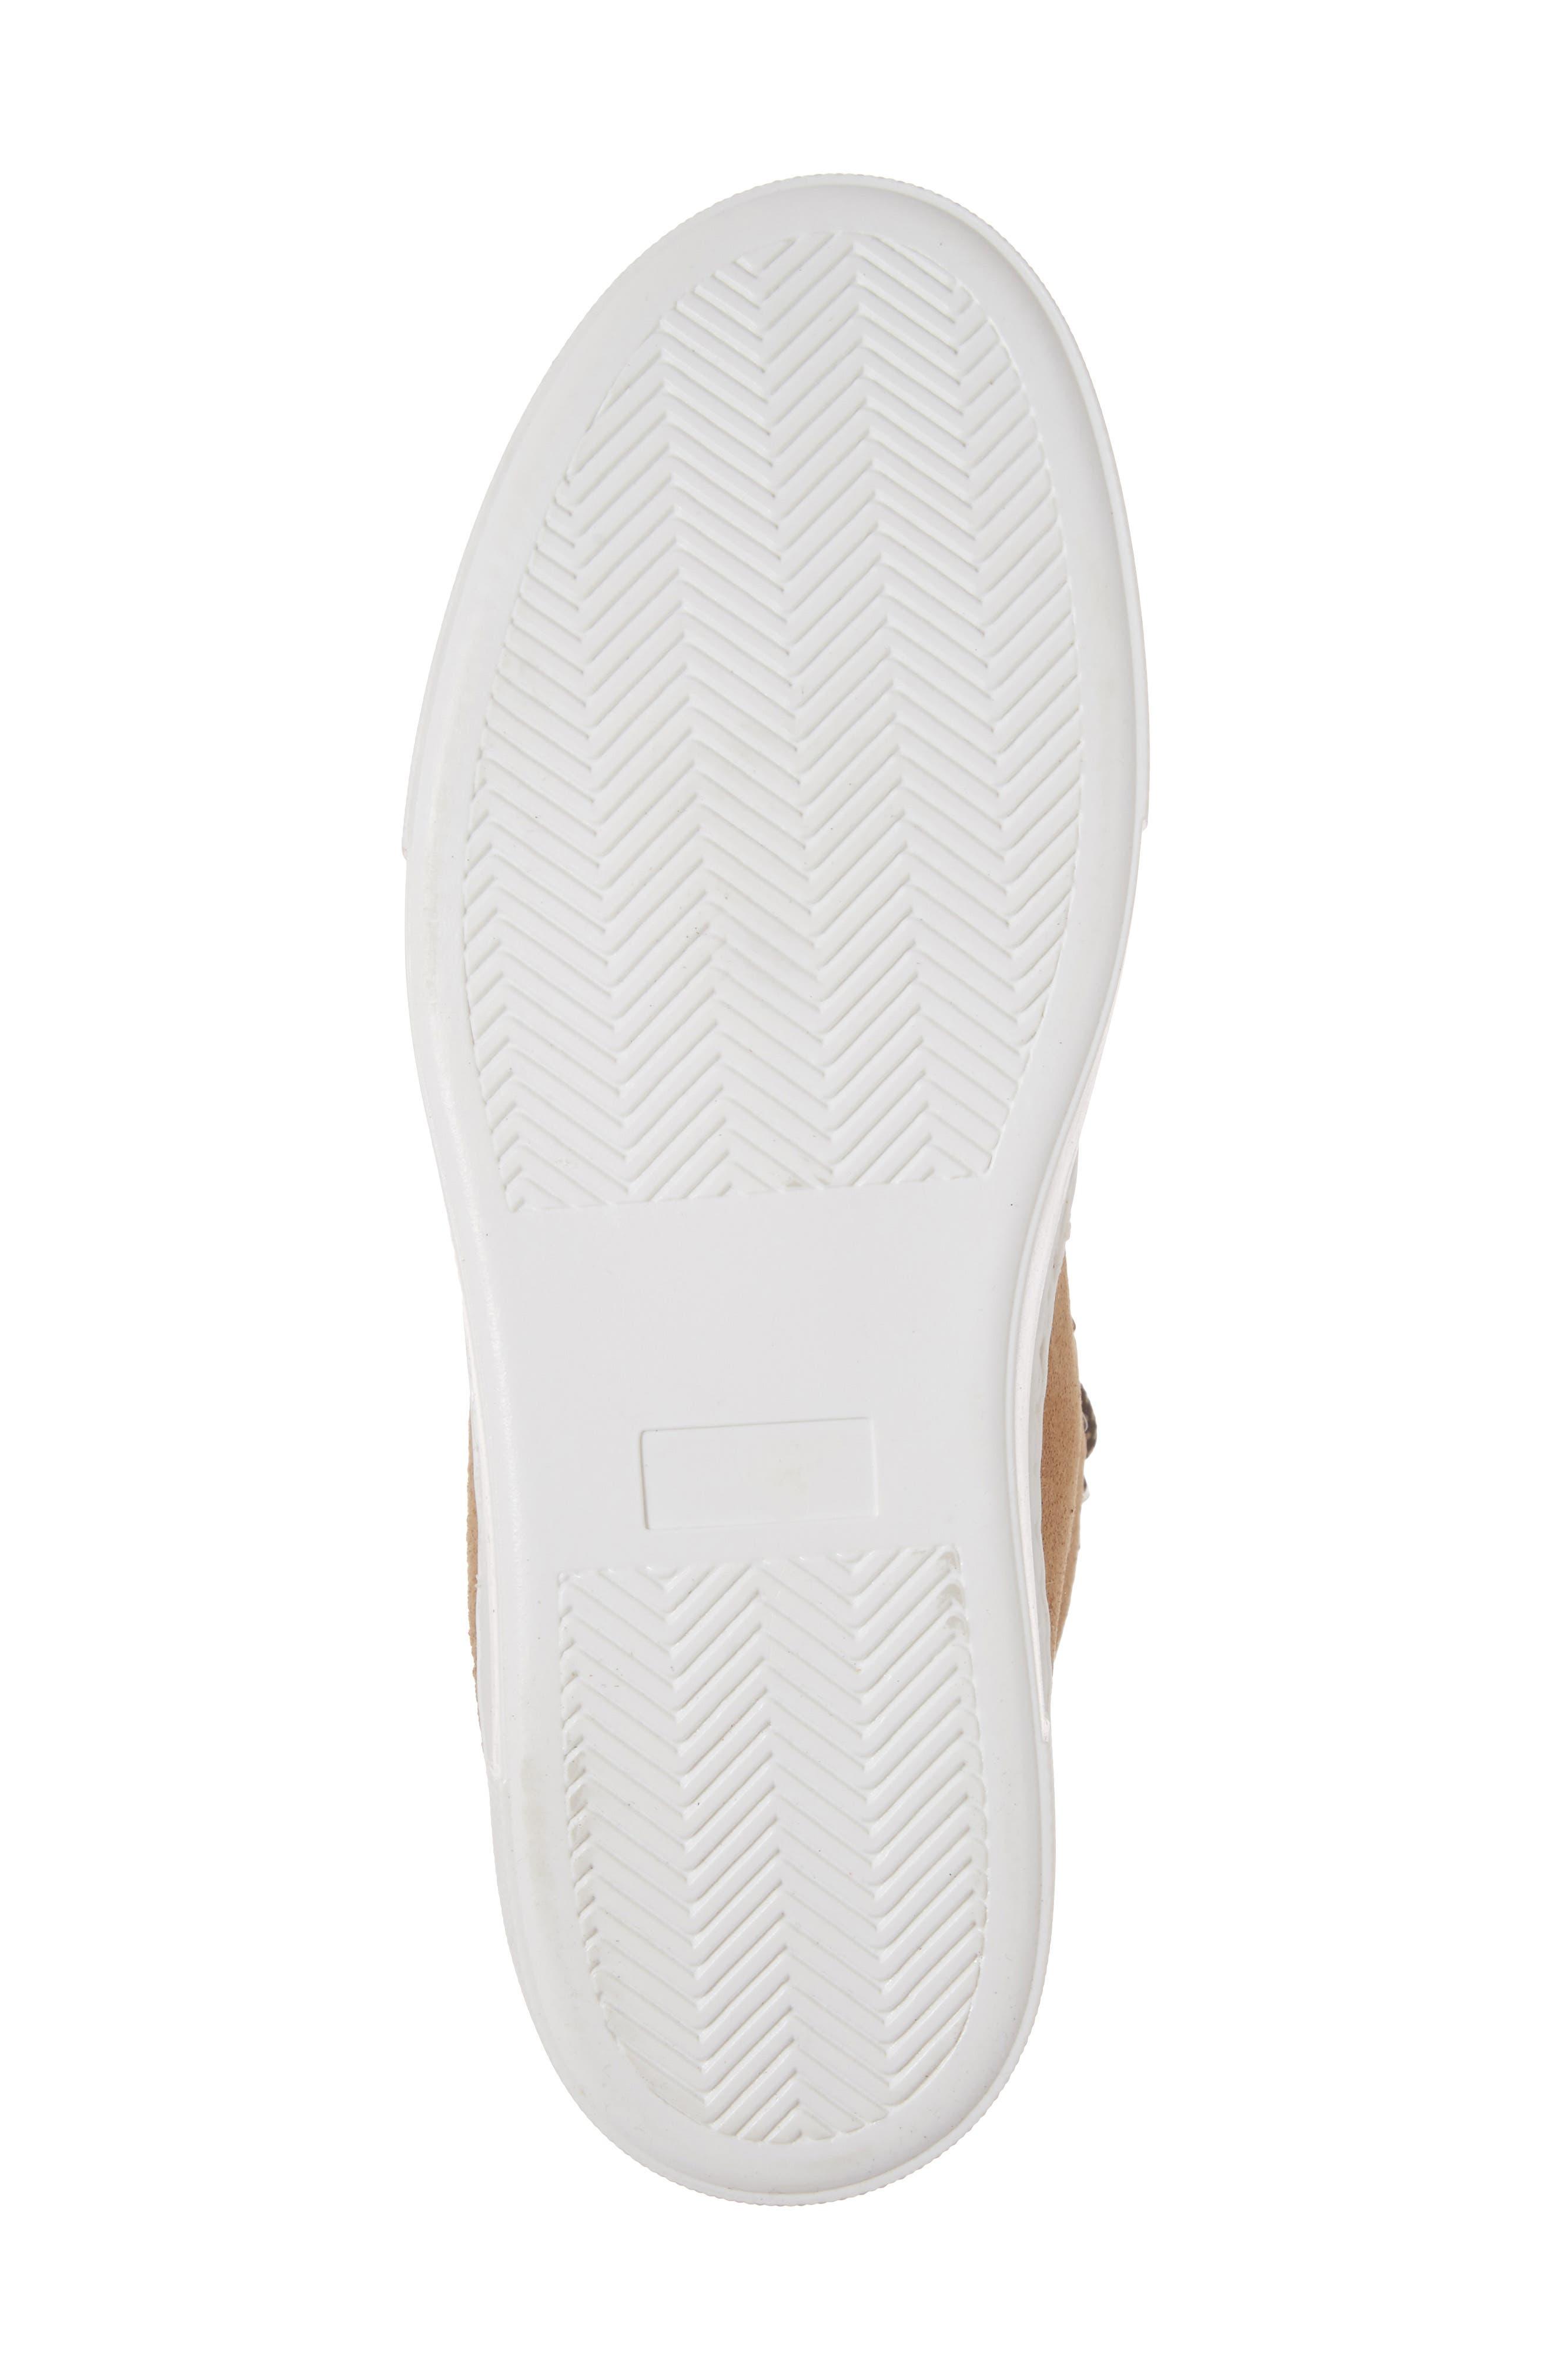 Cimone High Top Sneaker,                             Alternate thumbnail 6, color,                             263